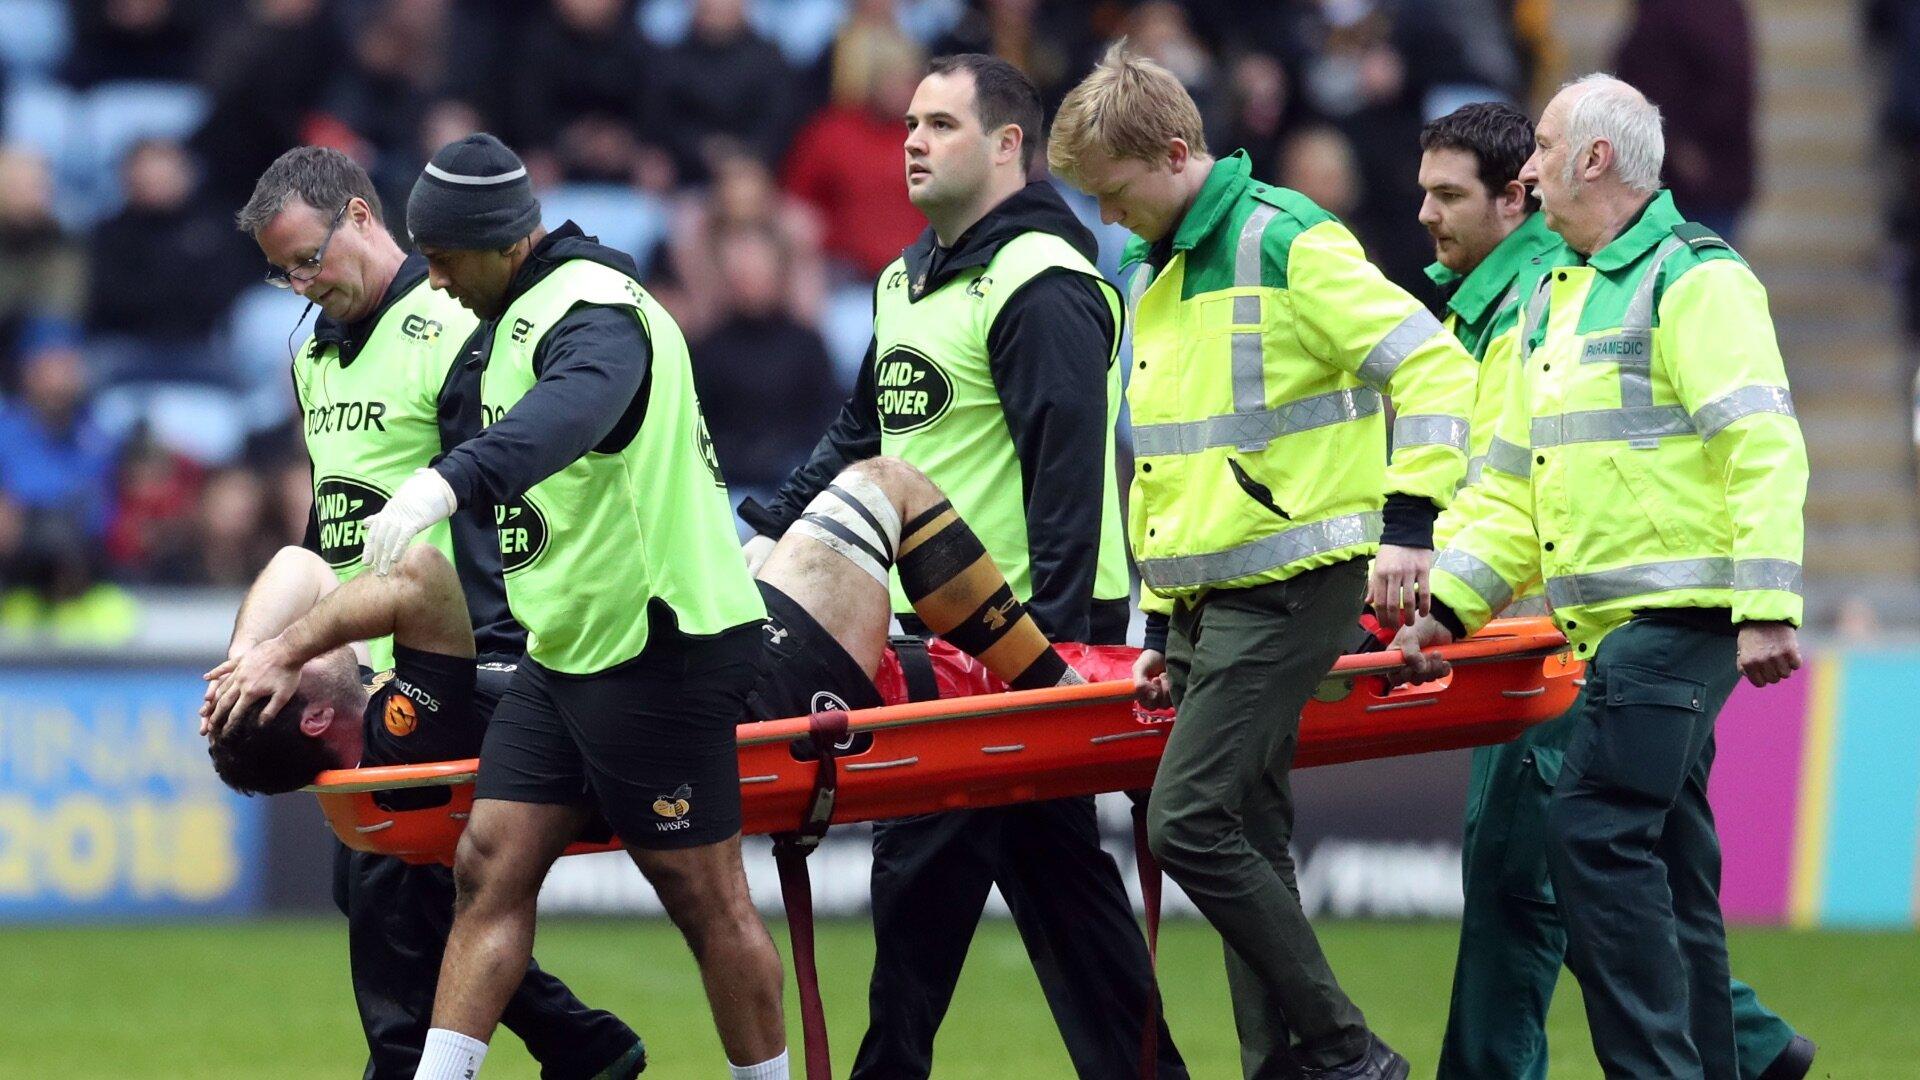 Rieder knee injury